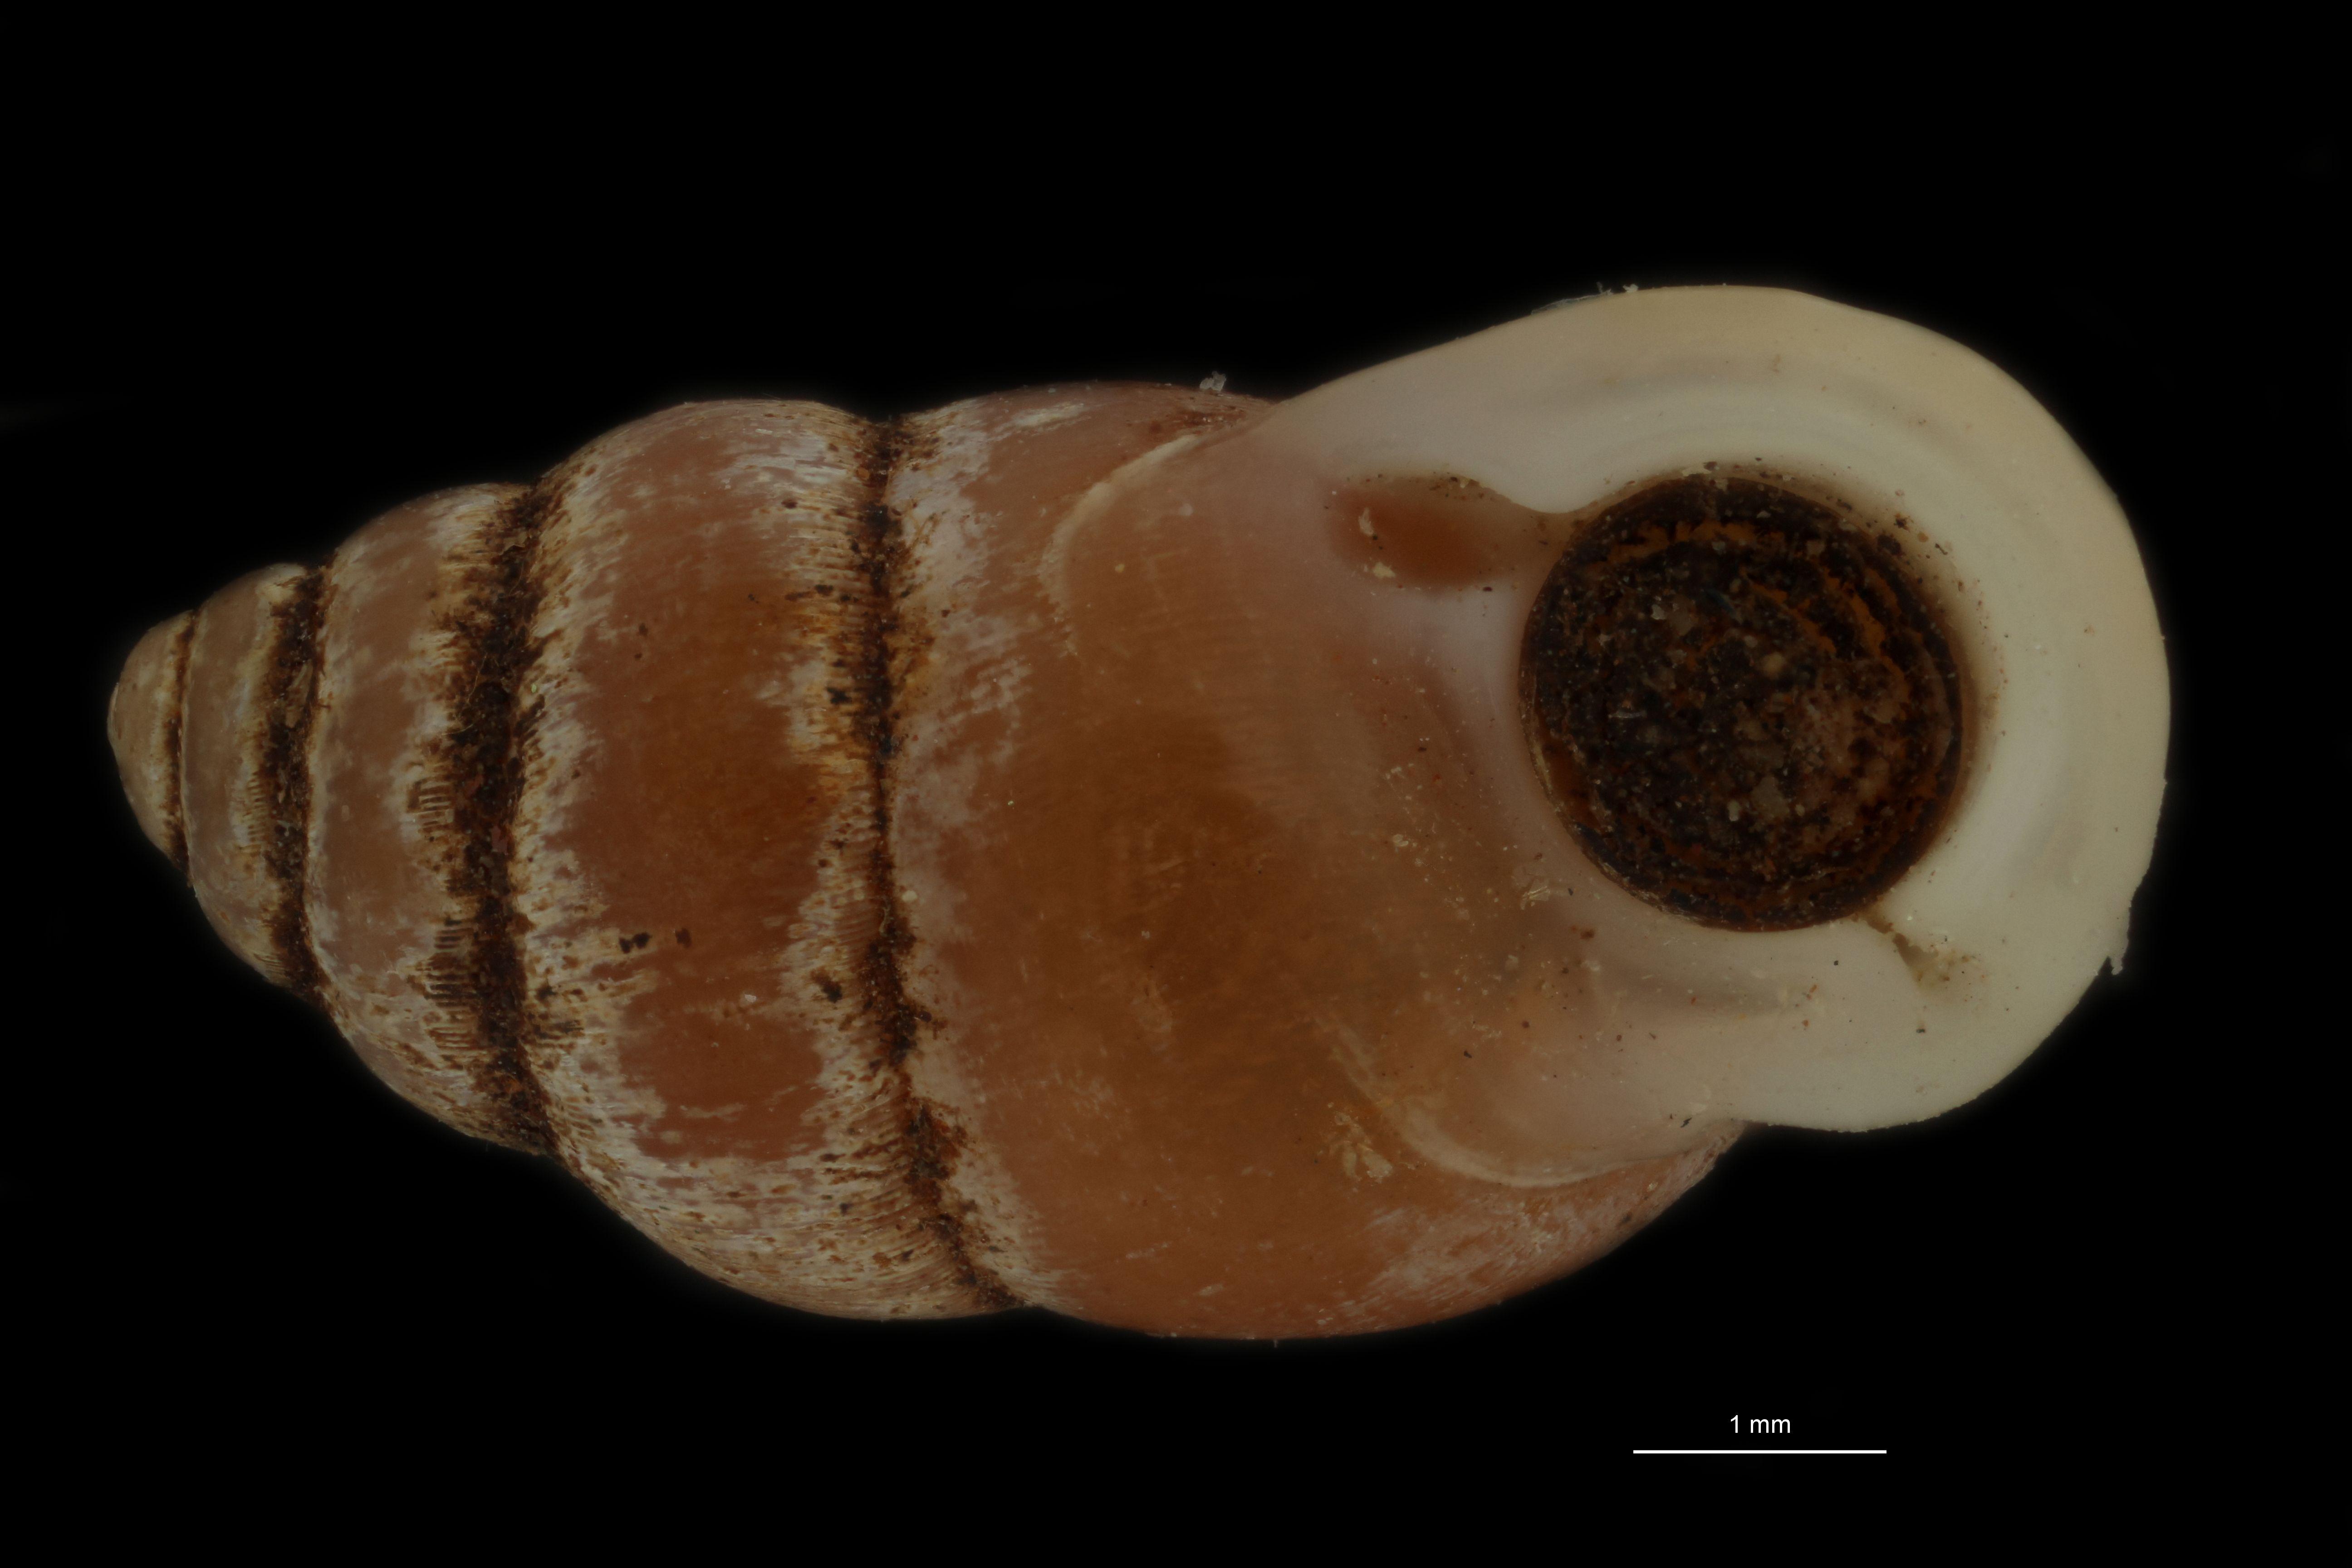 BE-RBINS-INV PARATYPE MT 956 Pupinella (Pupinopsis) funatoi FRONTAL.jpg